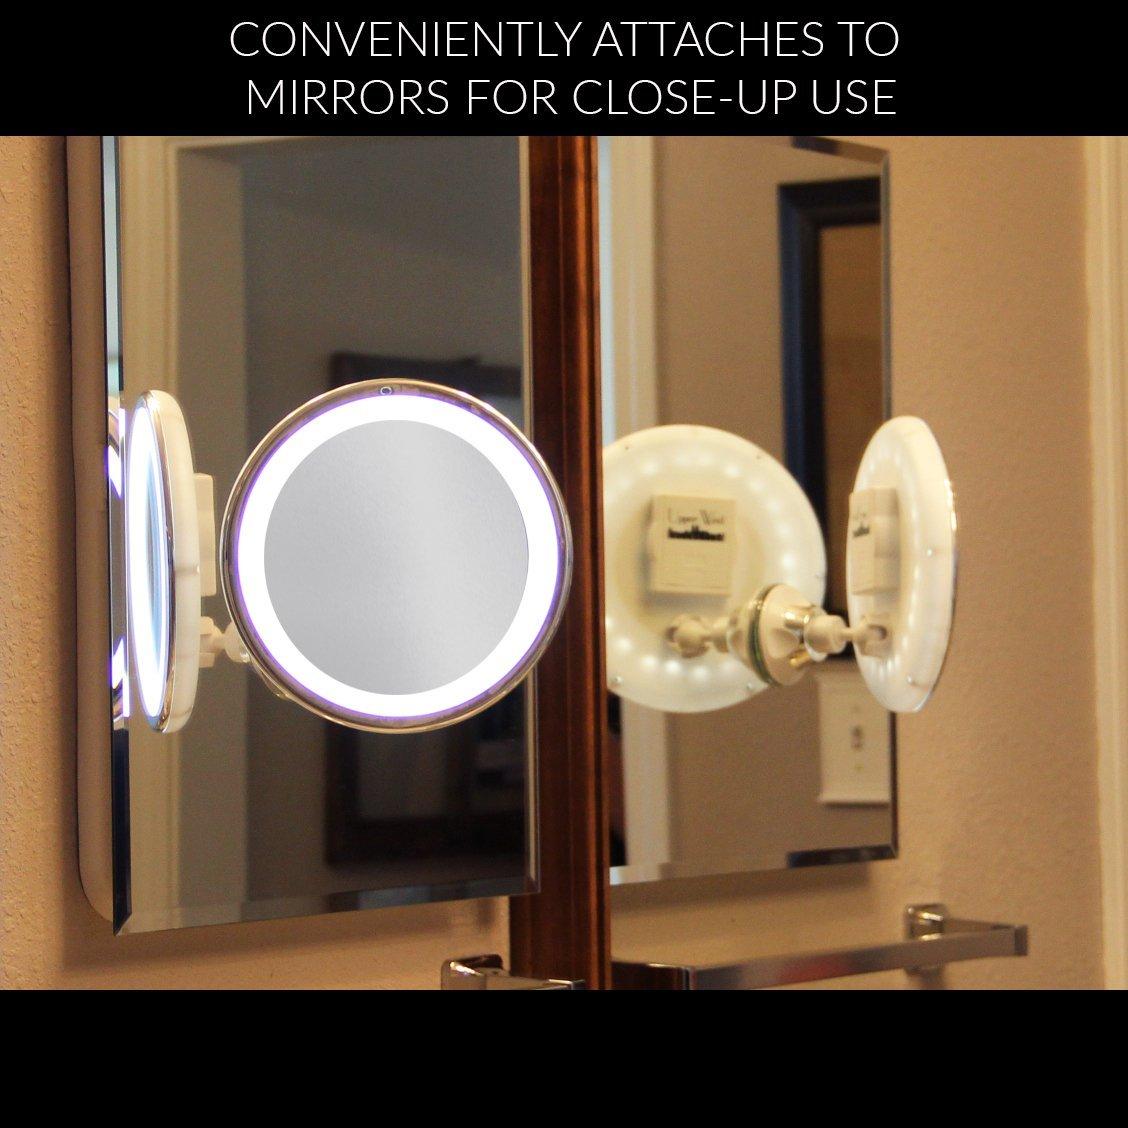 Amazon.com: 7x Magnifying Lighted Makeup Mirror. Warm LED Tap Bathroom  Vanity Mirror. Wireless U0026 Compact Travel Mirror: Beauty